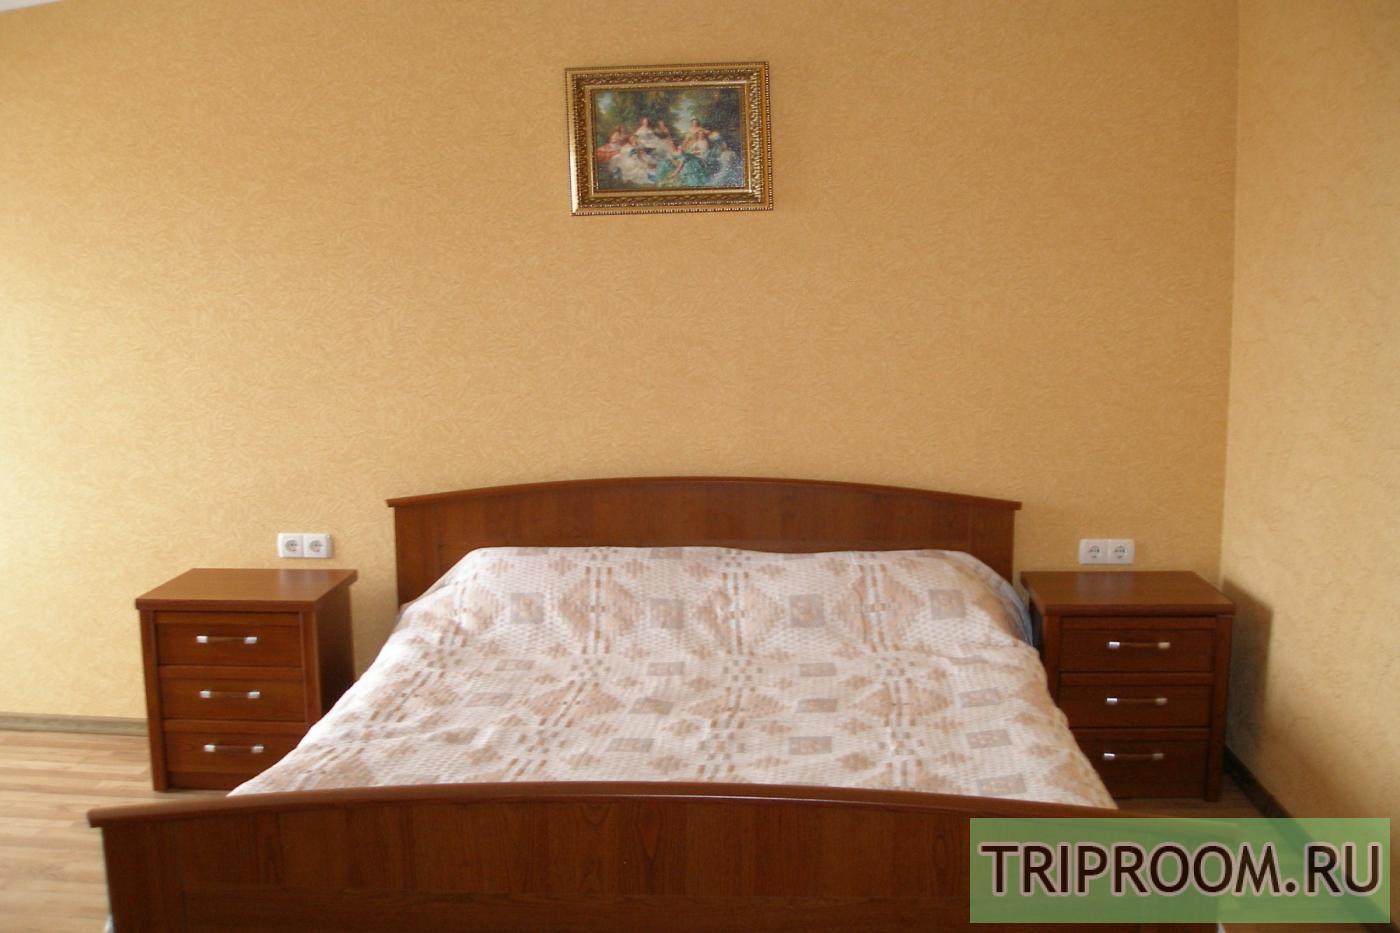 3-комнатная квартира посуточно (вариант № 34537), ул. Чехова улица, фото № 3